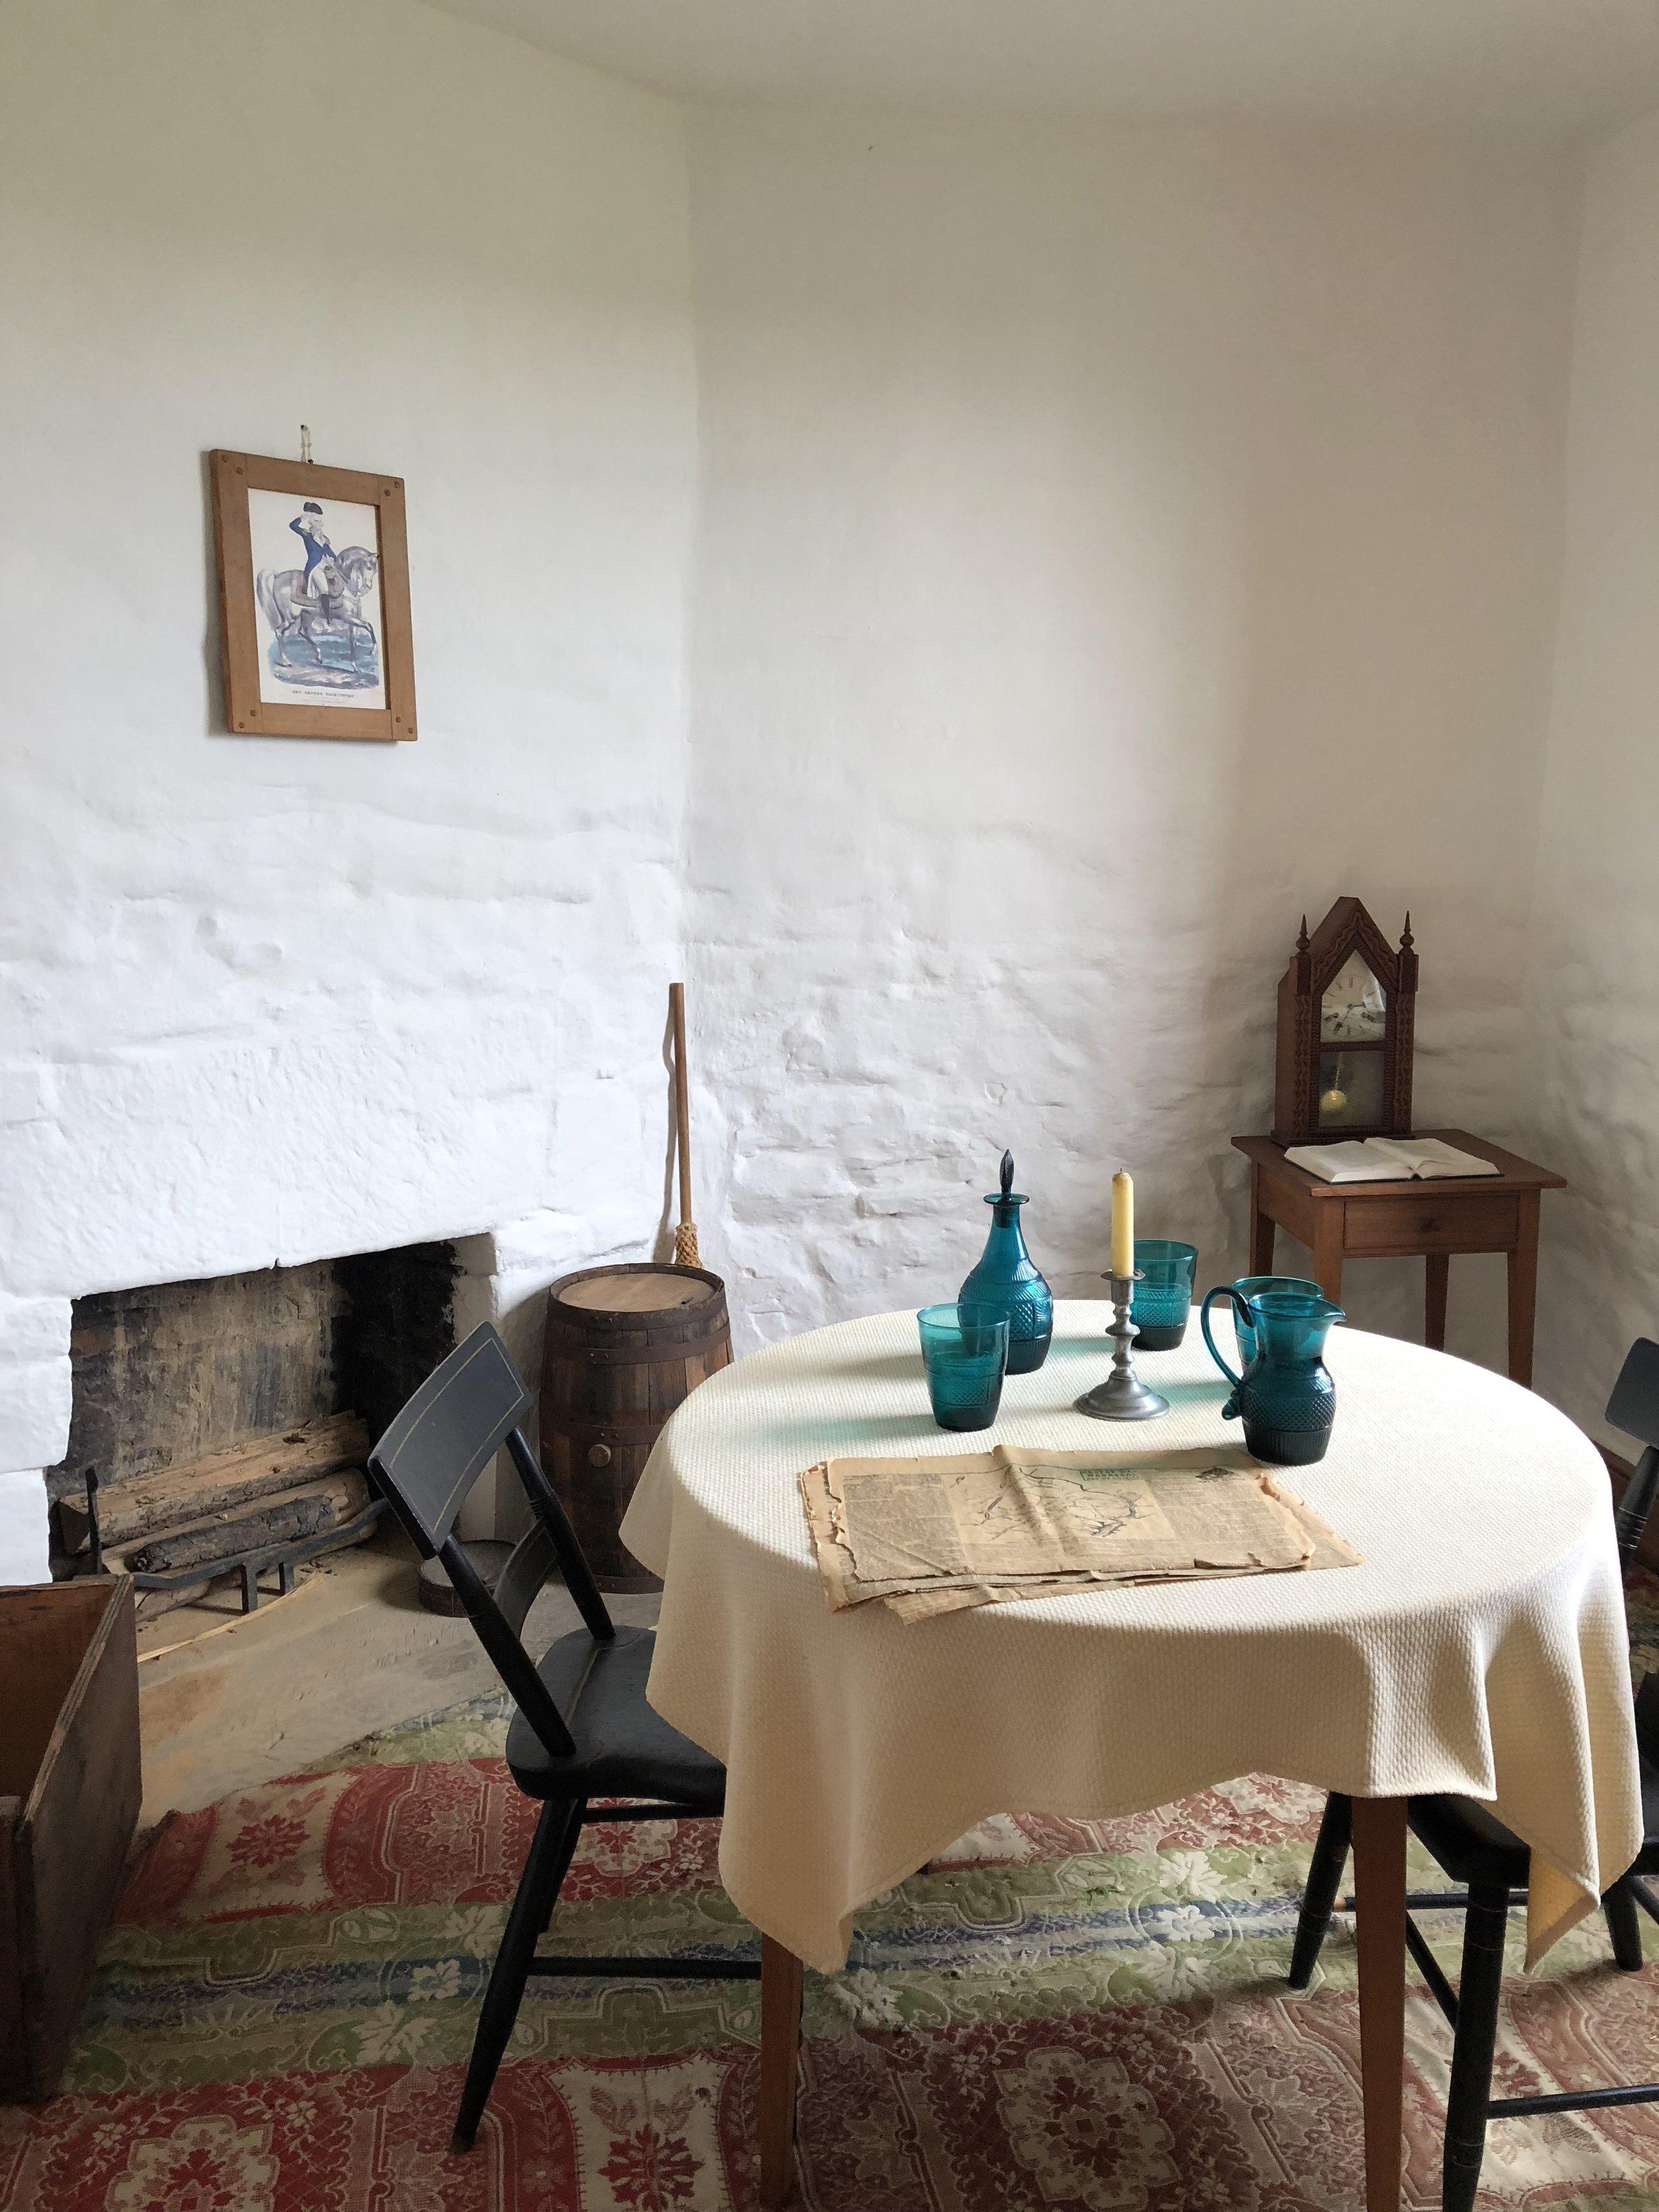 Inside the Stone House